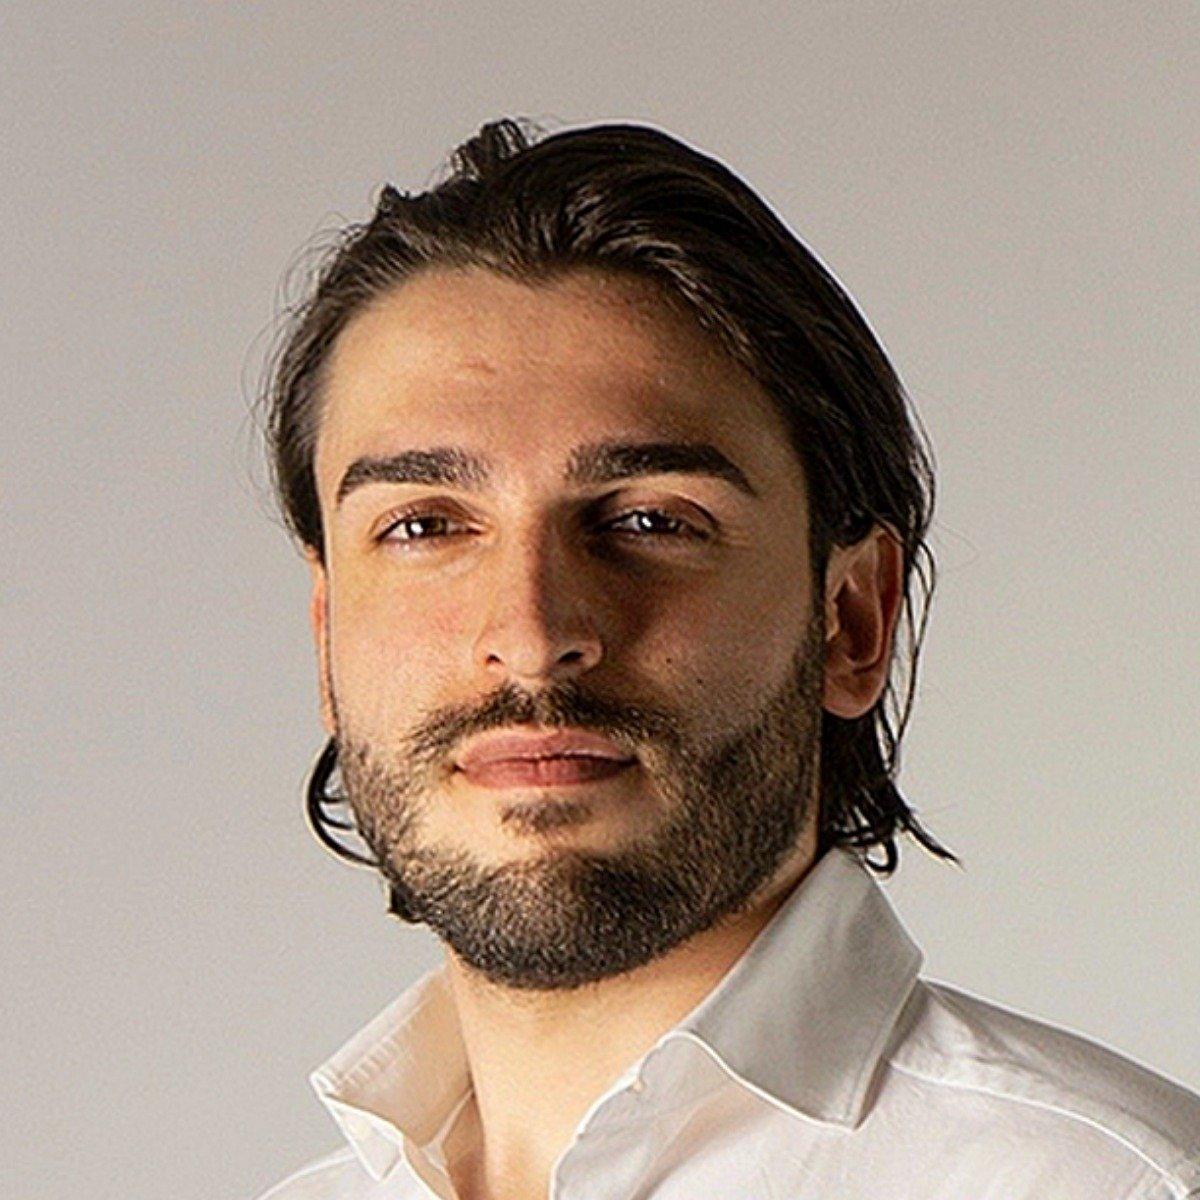 Davide Cicalese